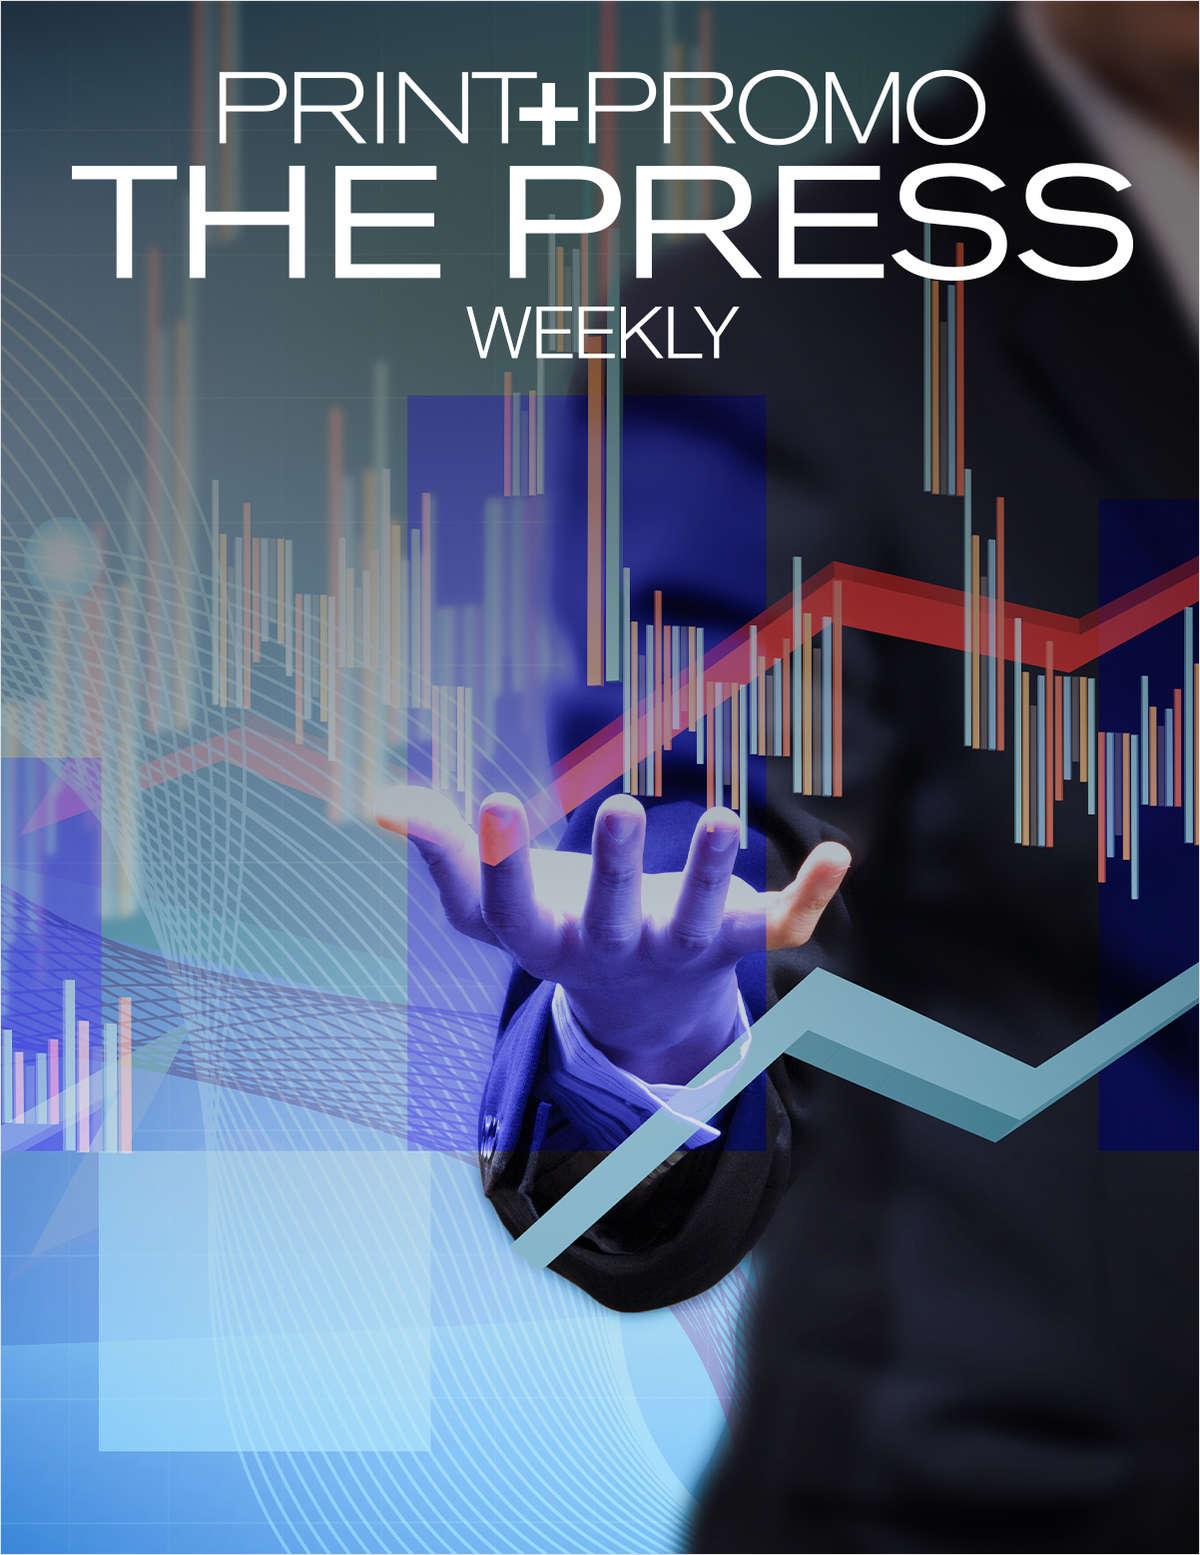 Print+Promo The Press